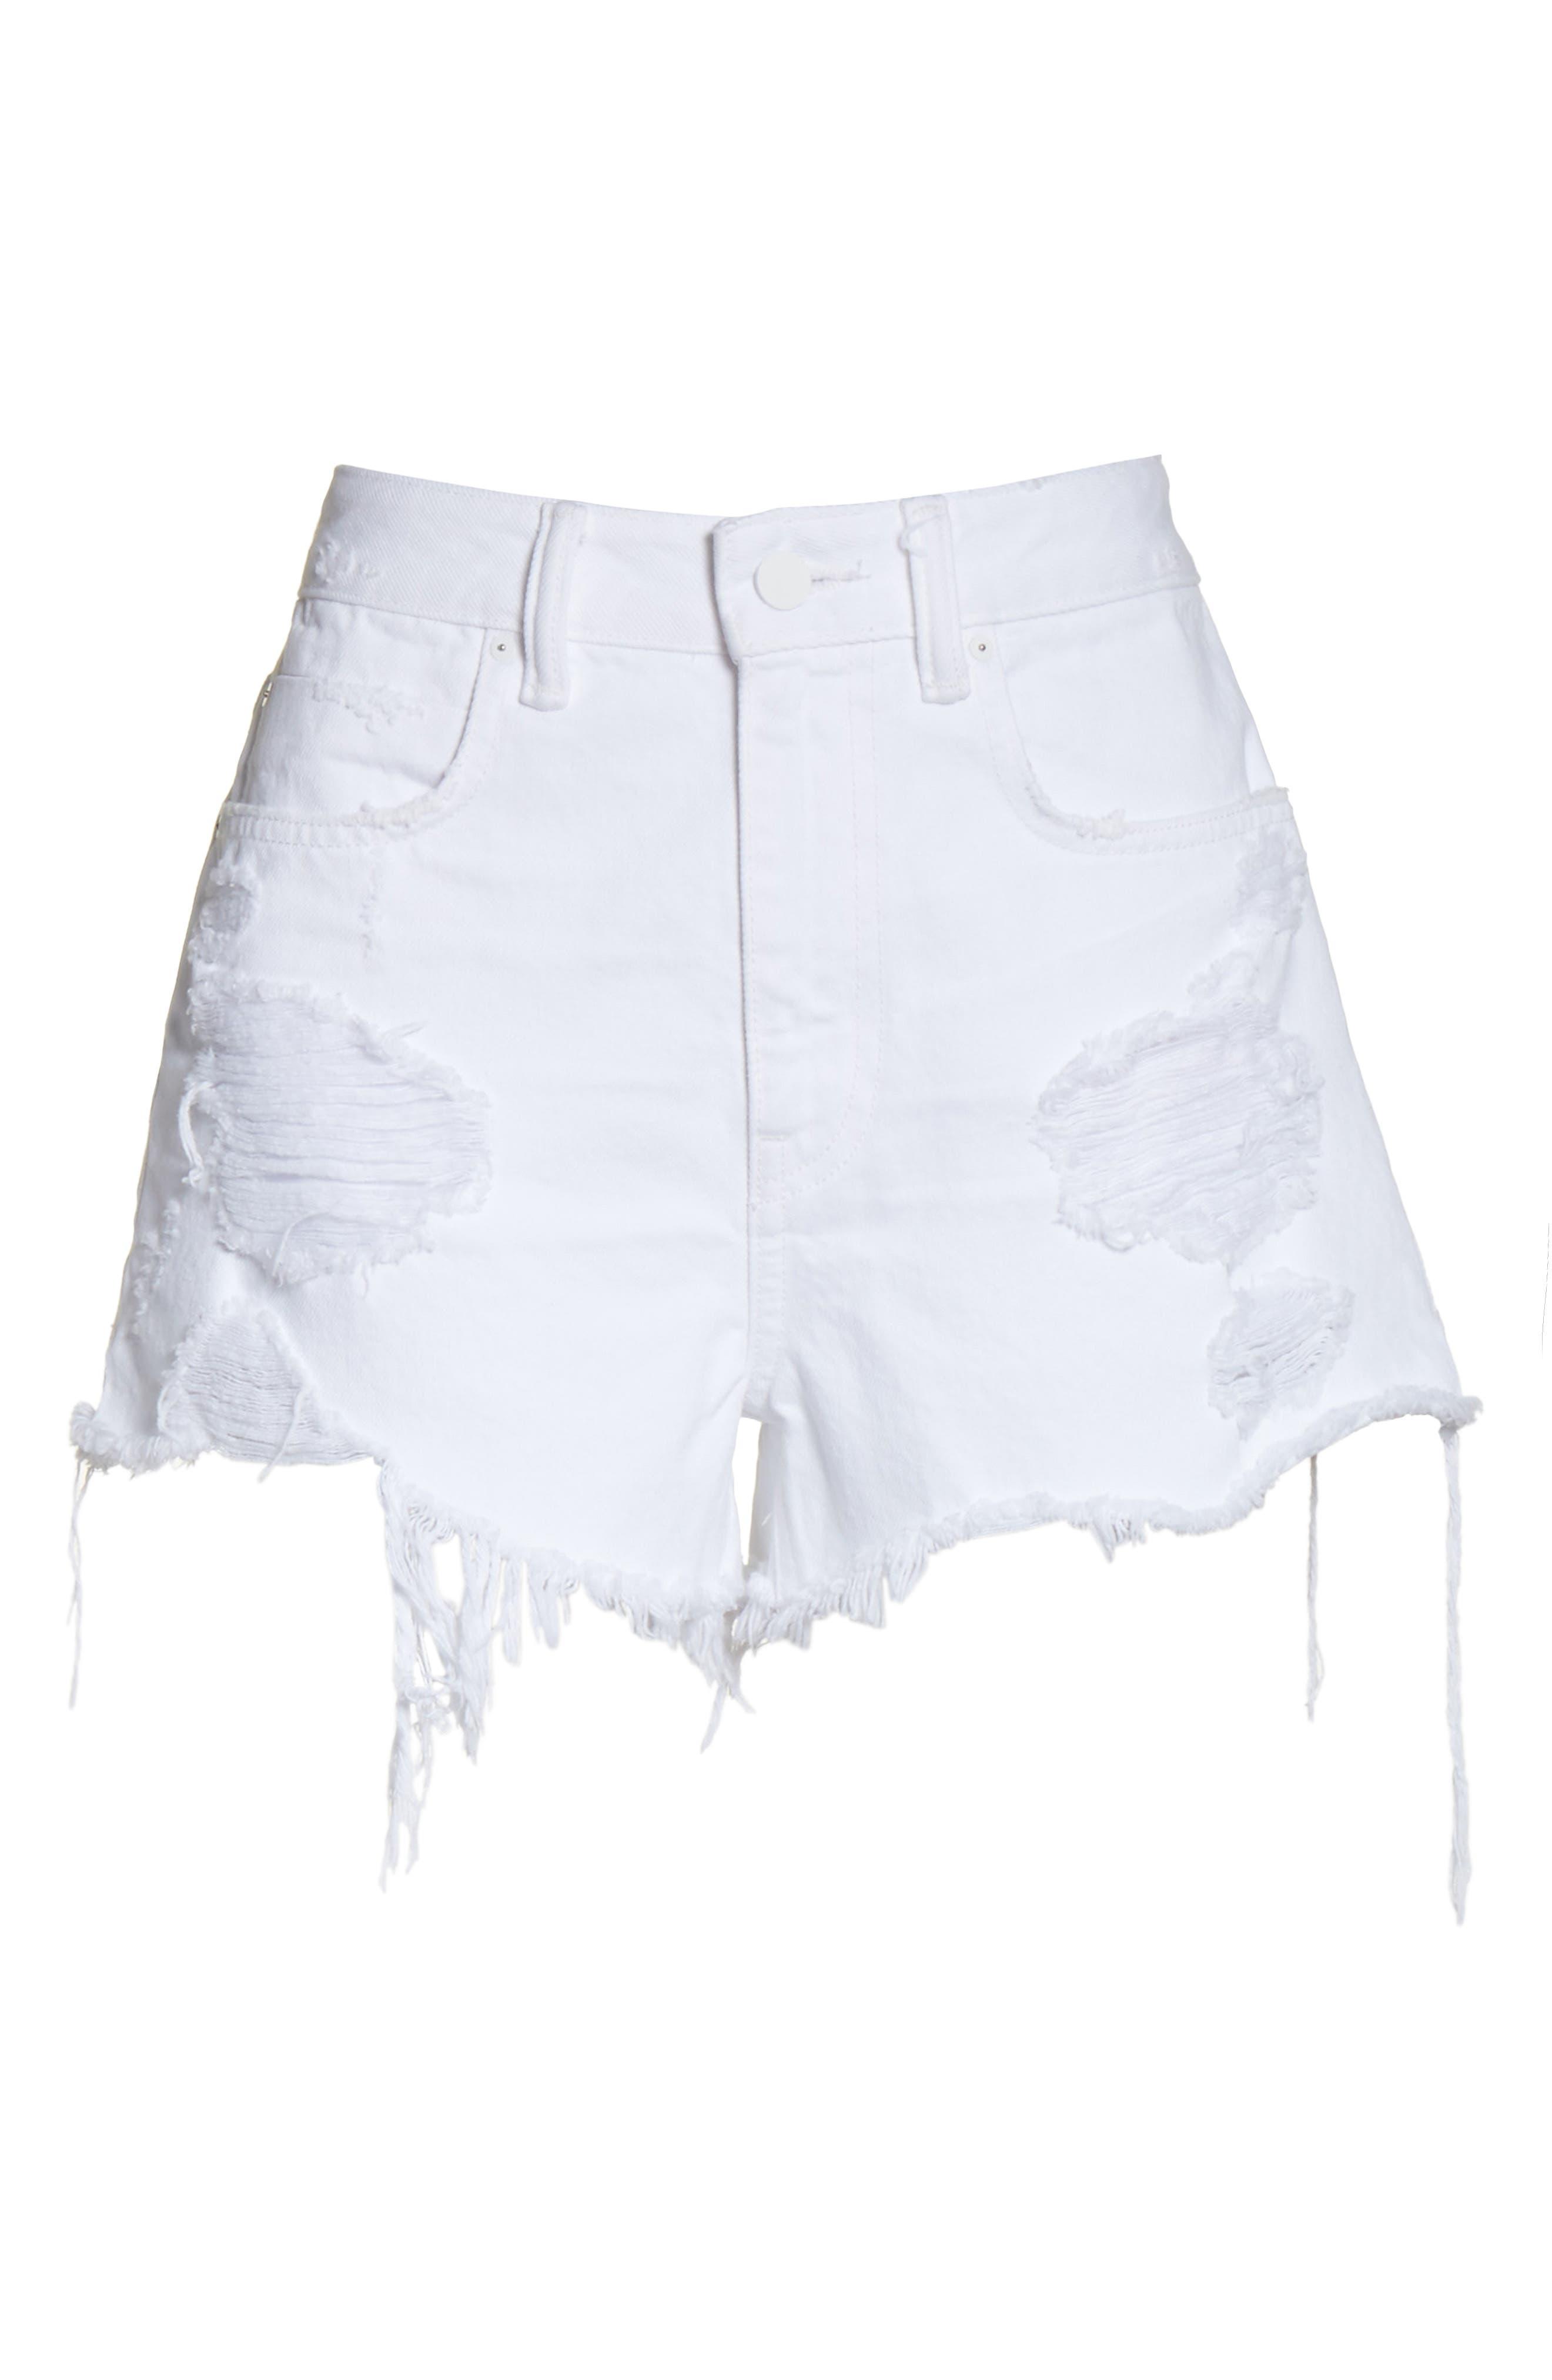 Bite White Ripped Denim Shorts,                             Alternate thumbnail 6, color,                             Bleached Destroy